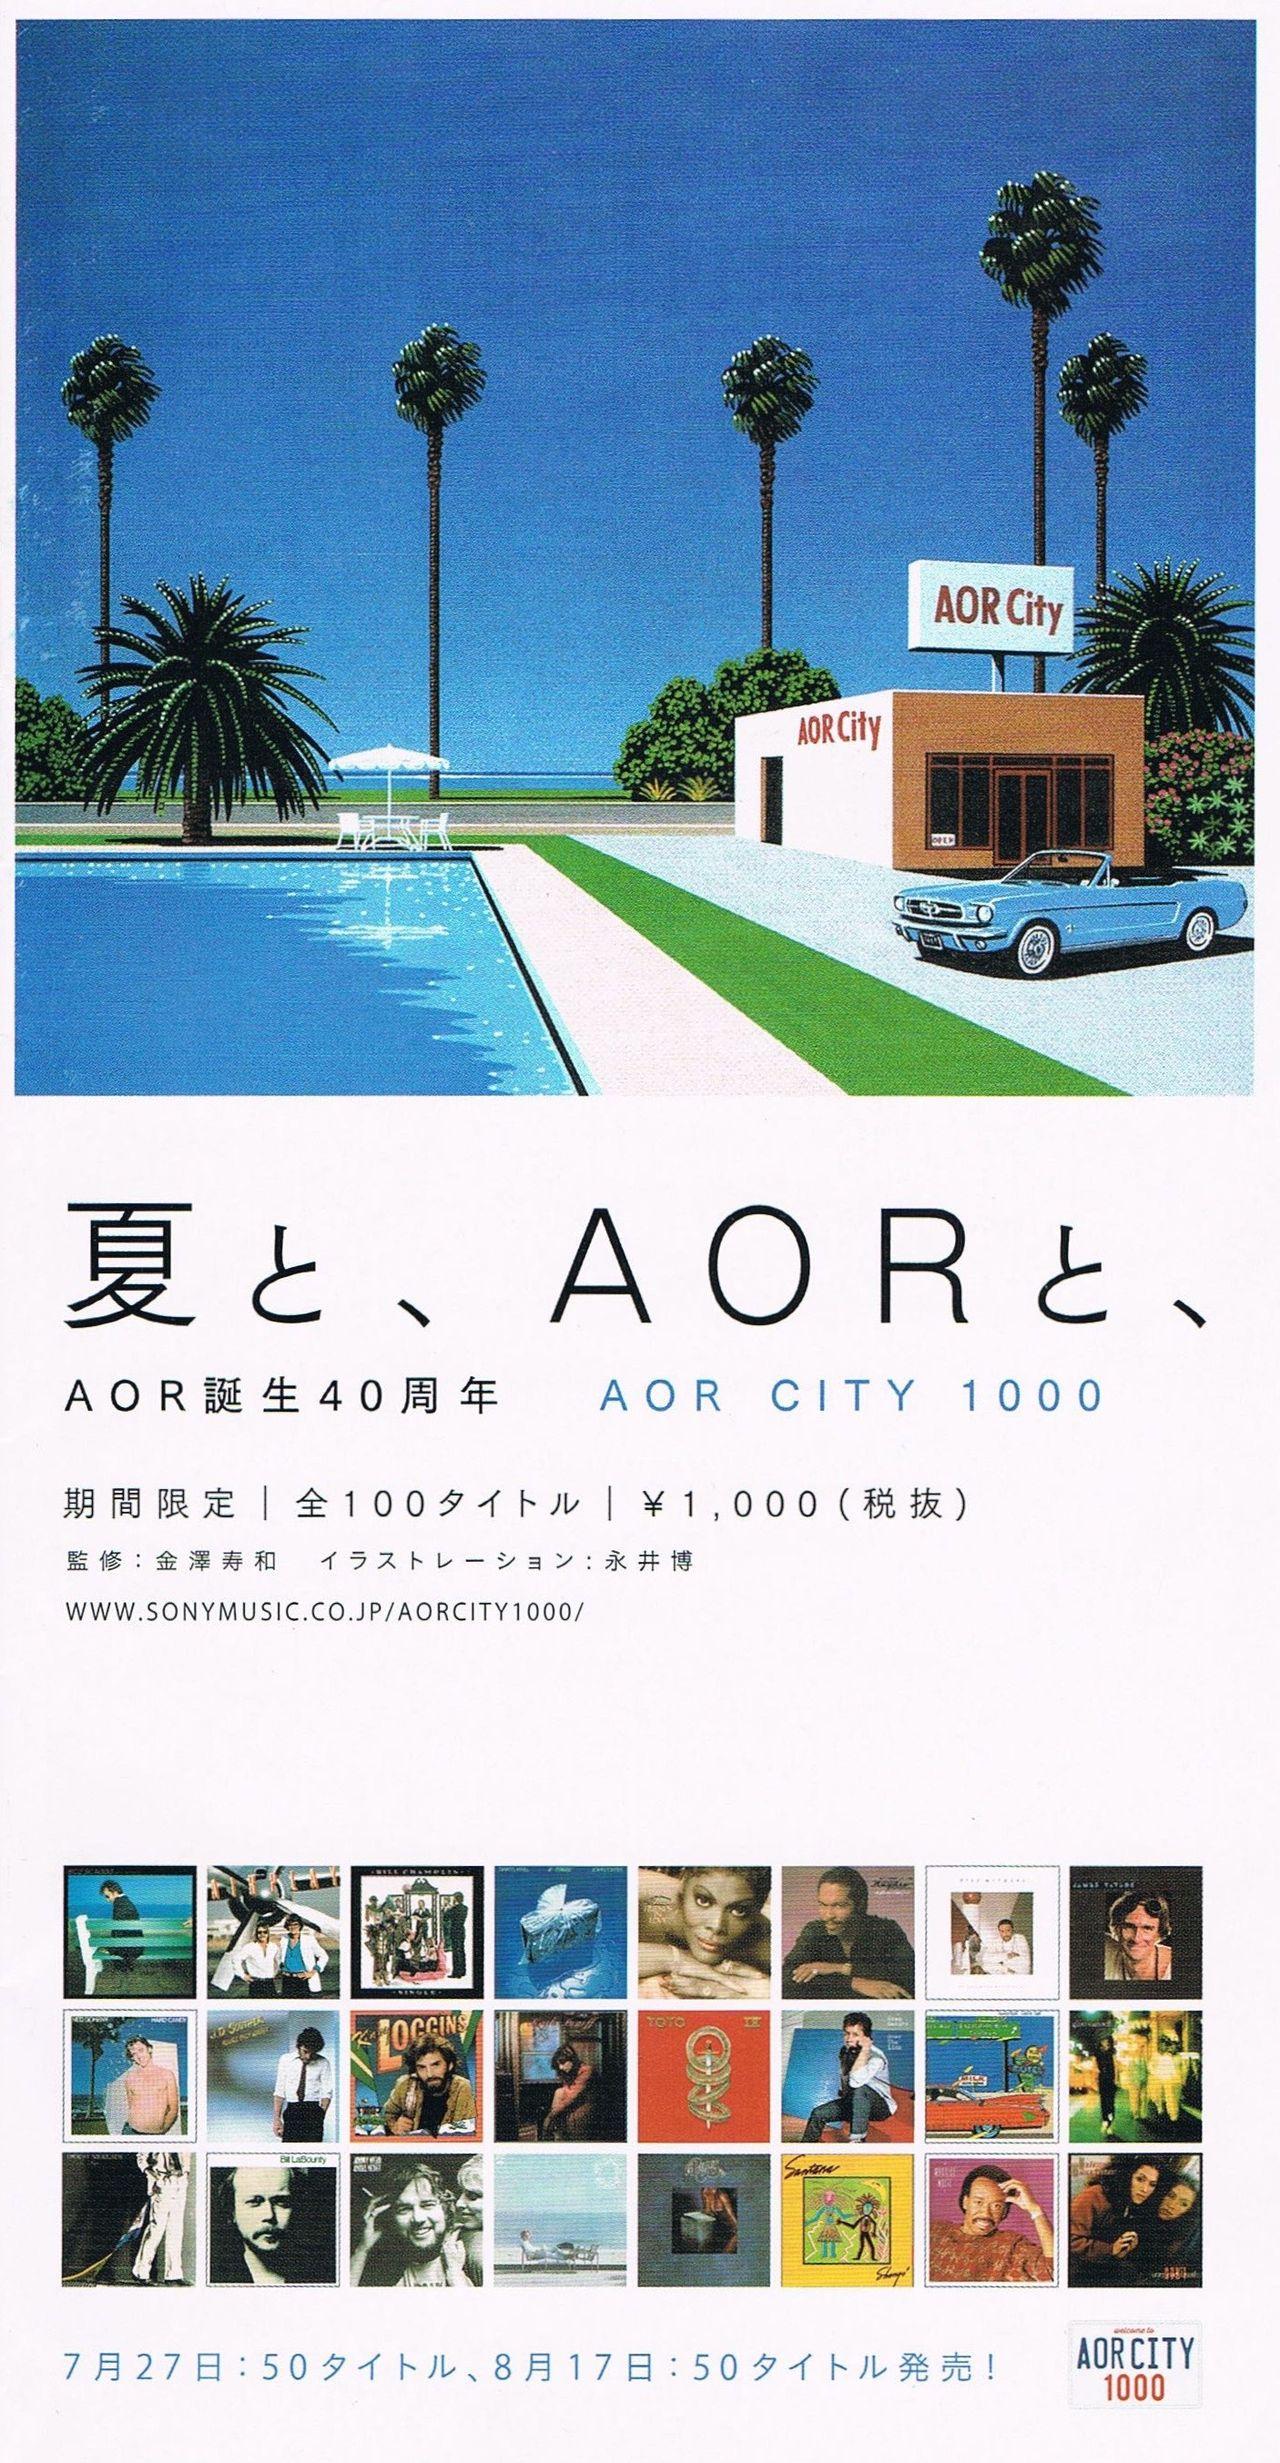 aor city 1000